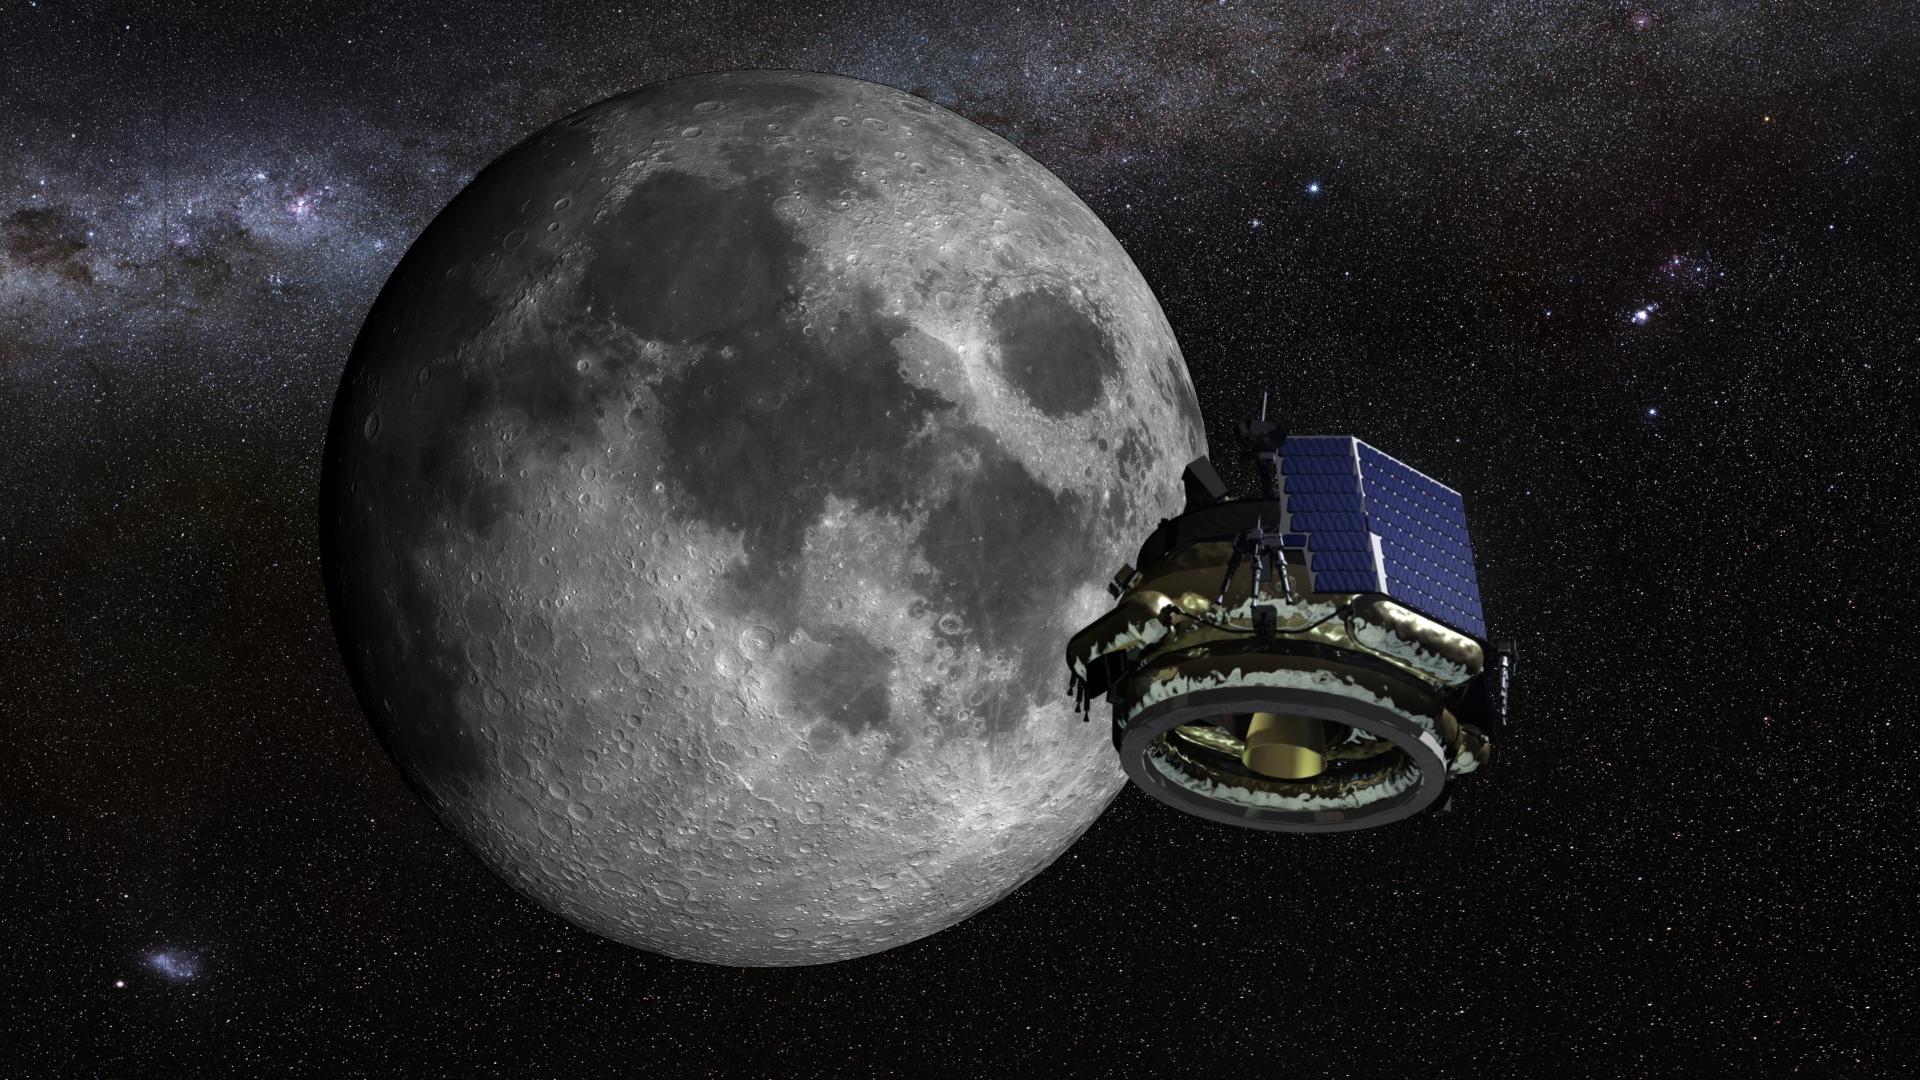 Team Indus, Japan's Hakuto combine for Moon mission